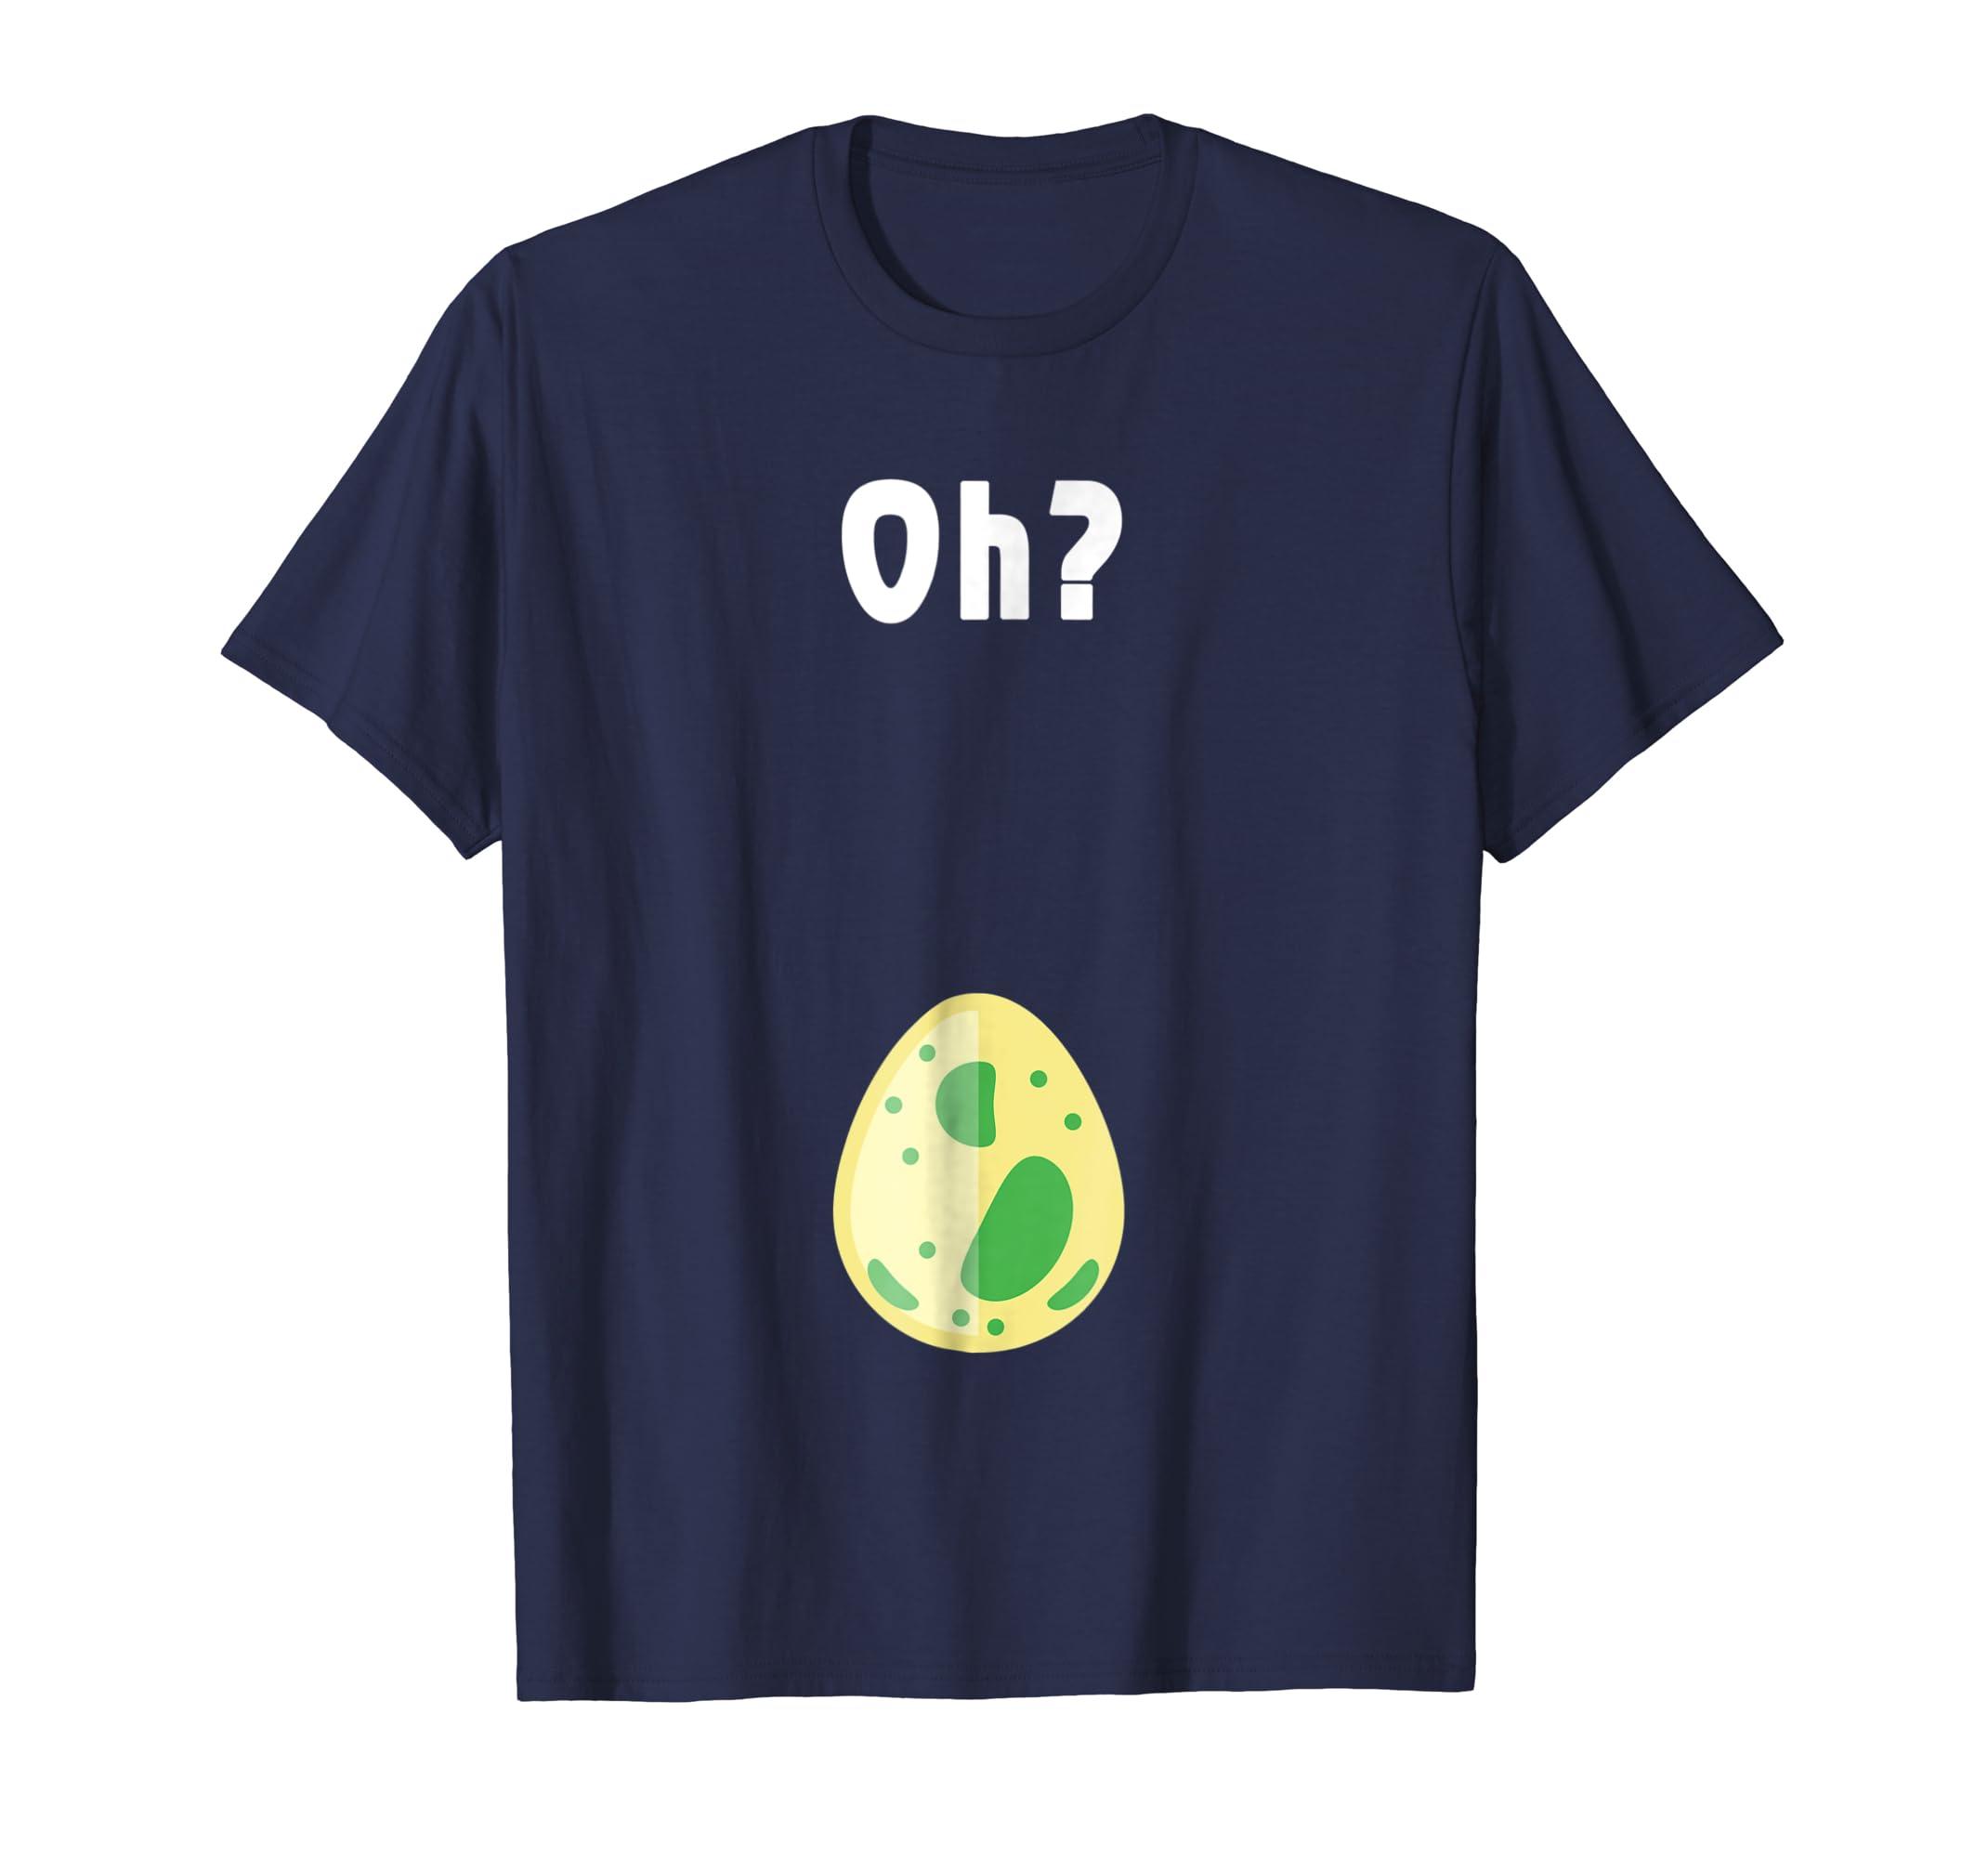 Gamer Hatching Egg Oh? Pregnant Women Funny T Shirt-Awarplus